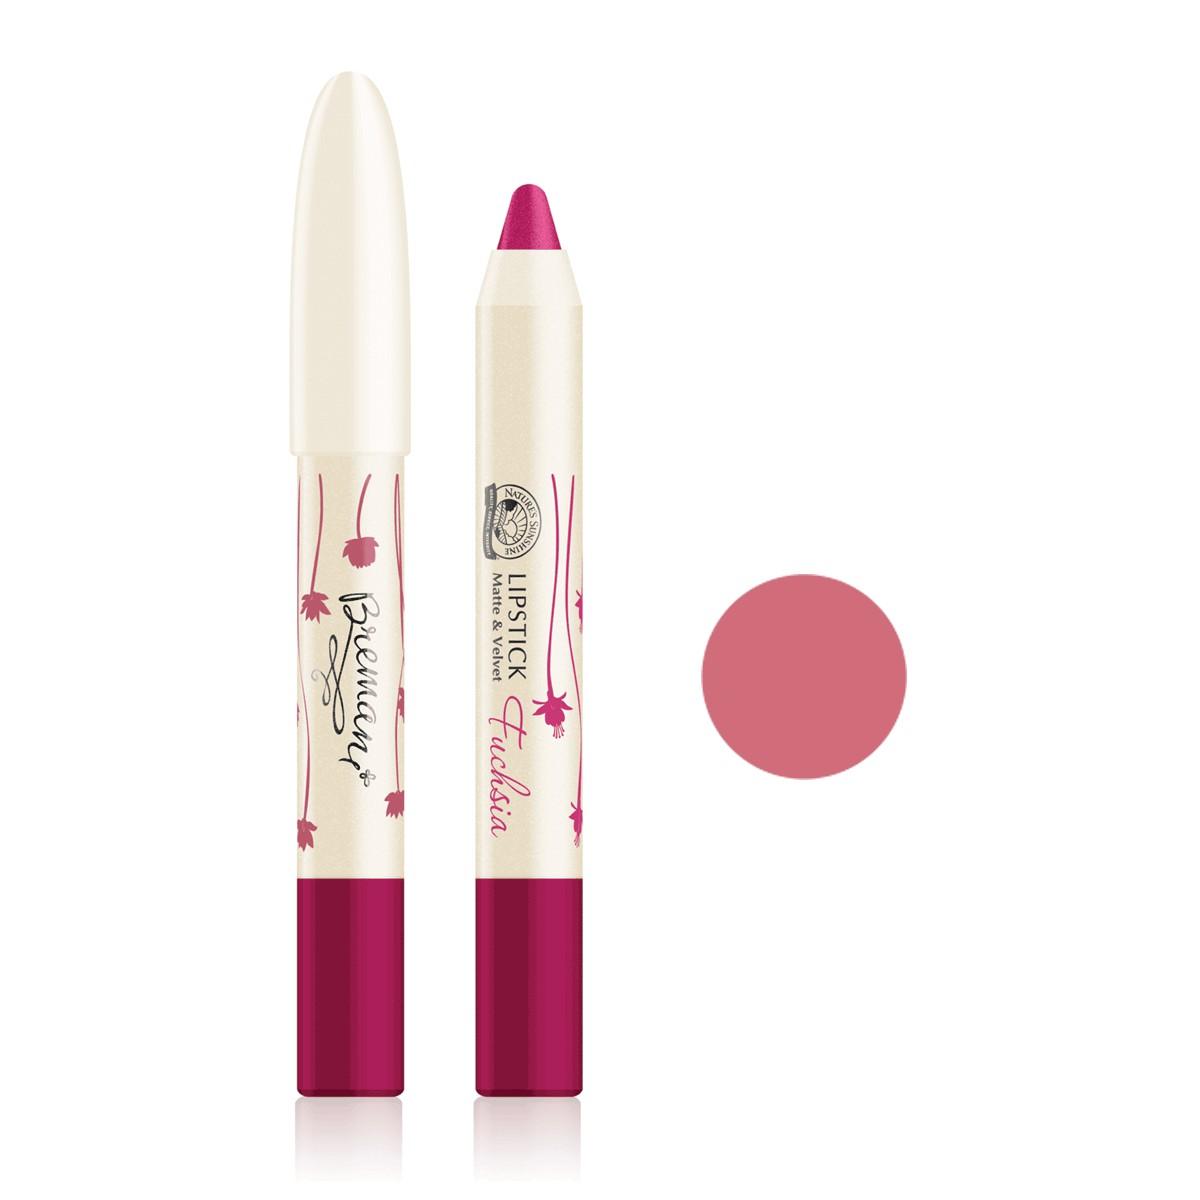 Набор 1+1: Lipstick Shiny&Velvet Pink lotus (-30%) [64854] + Mascara Charming Lash/Volume&Length Fantasy [62057] (1 шт) (09,2017)